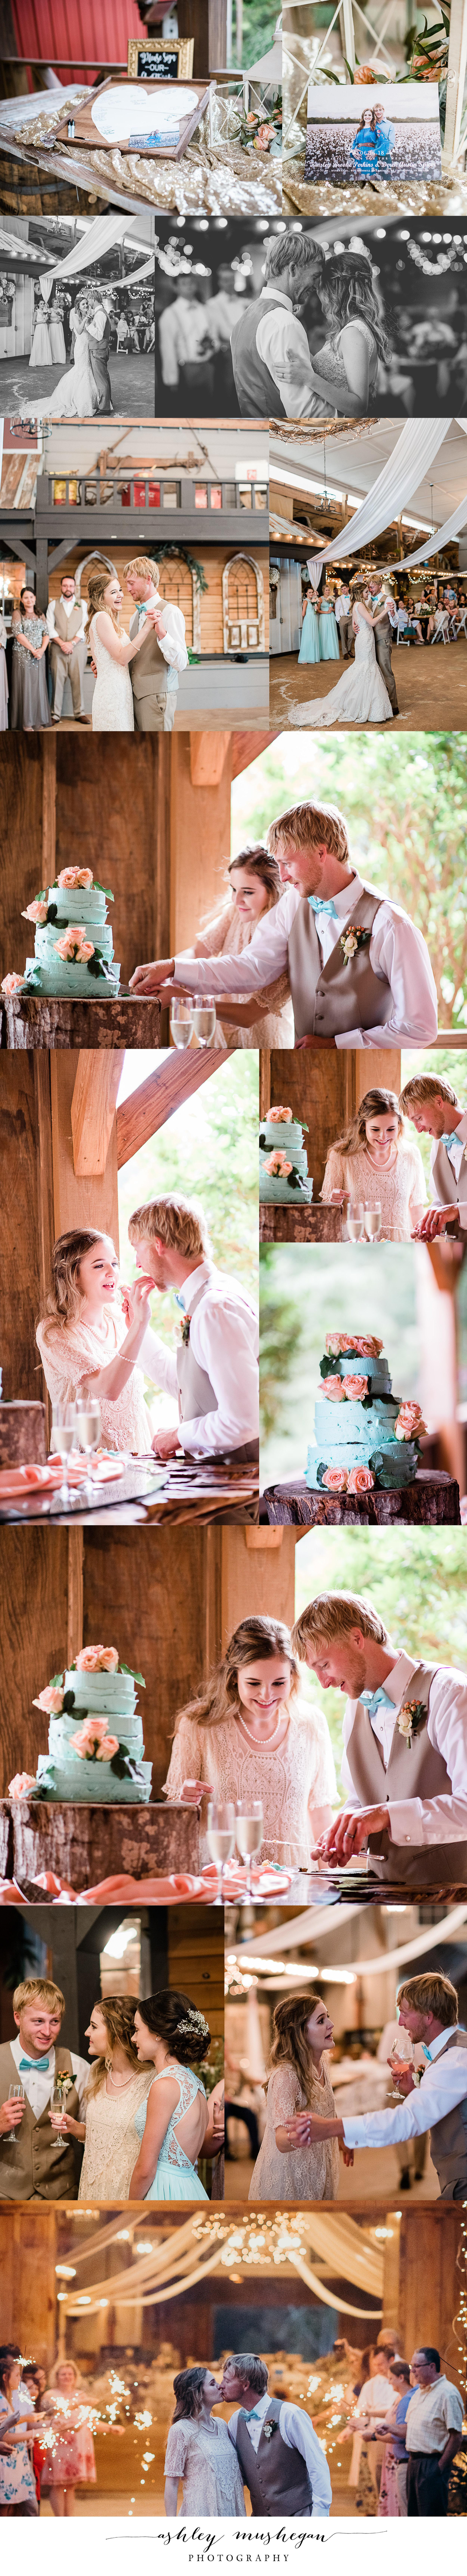 perkins wedding blog 7.jpg